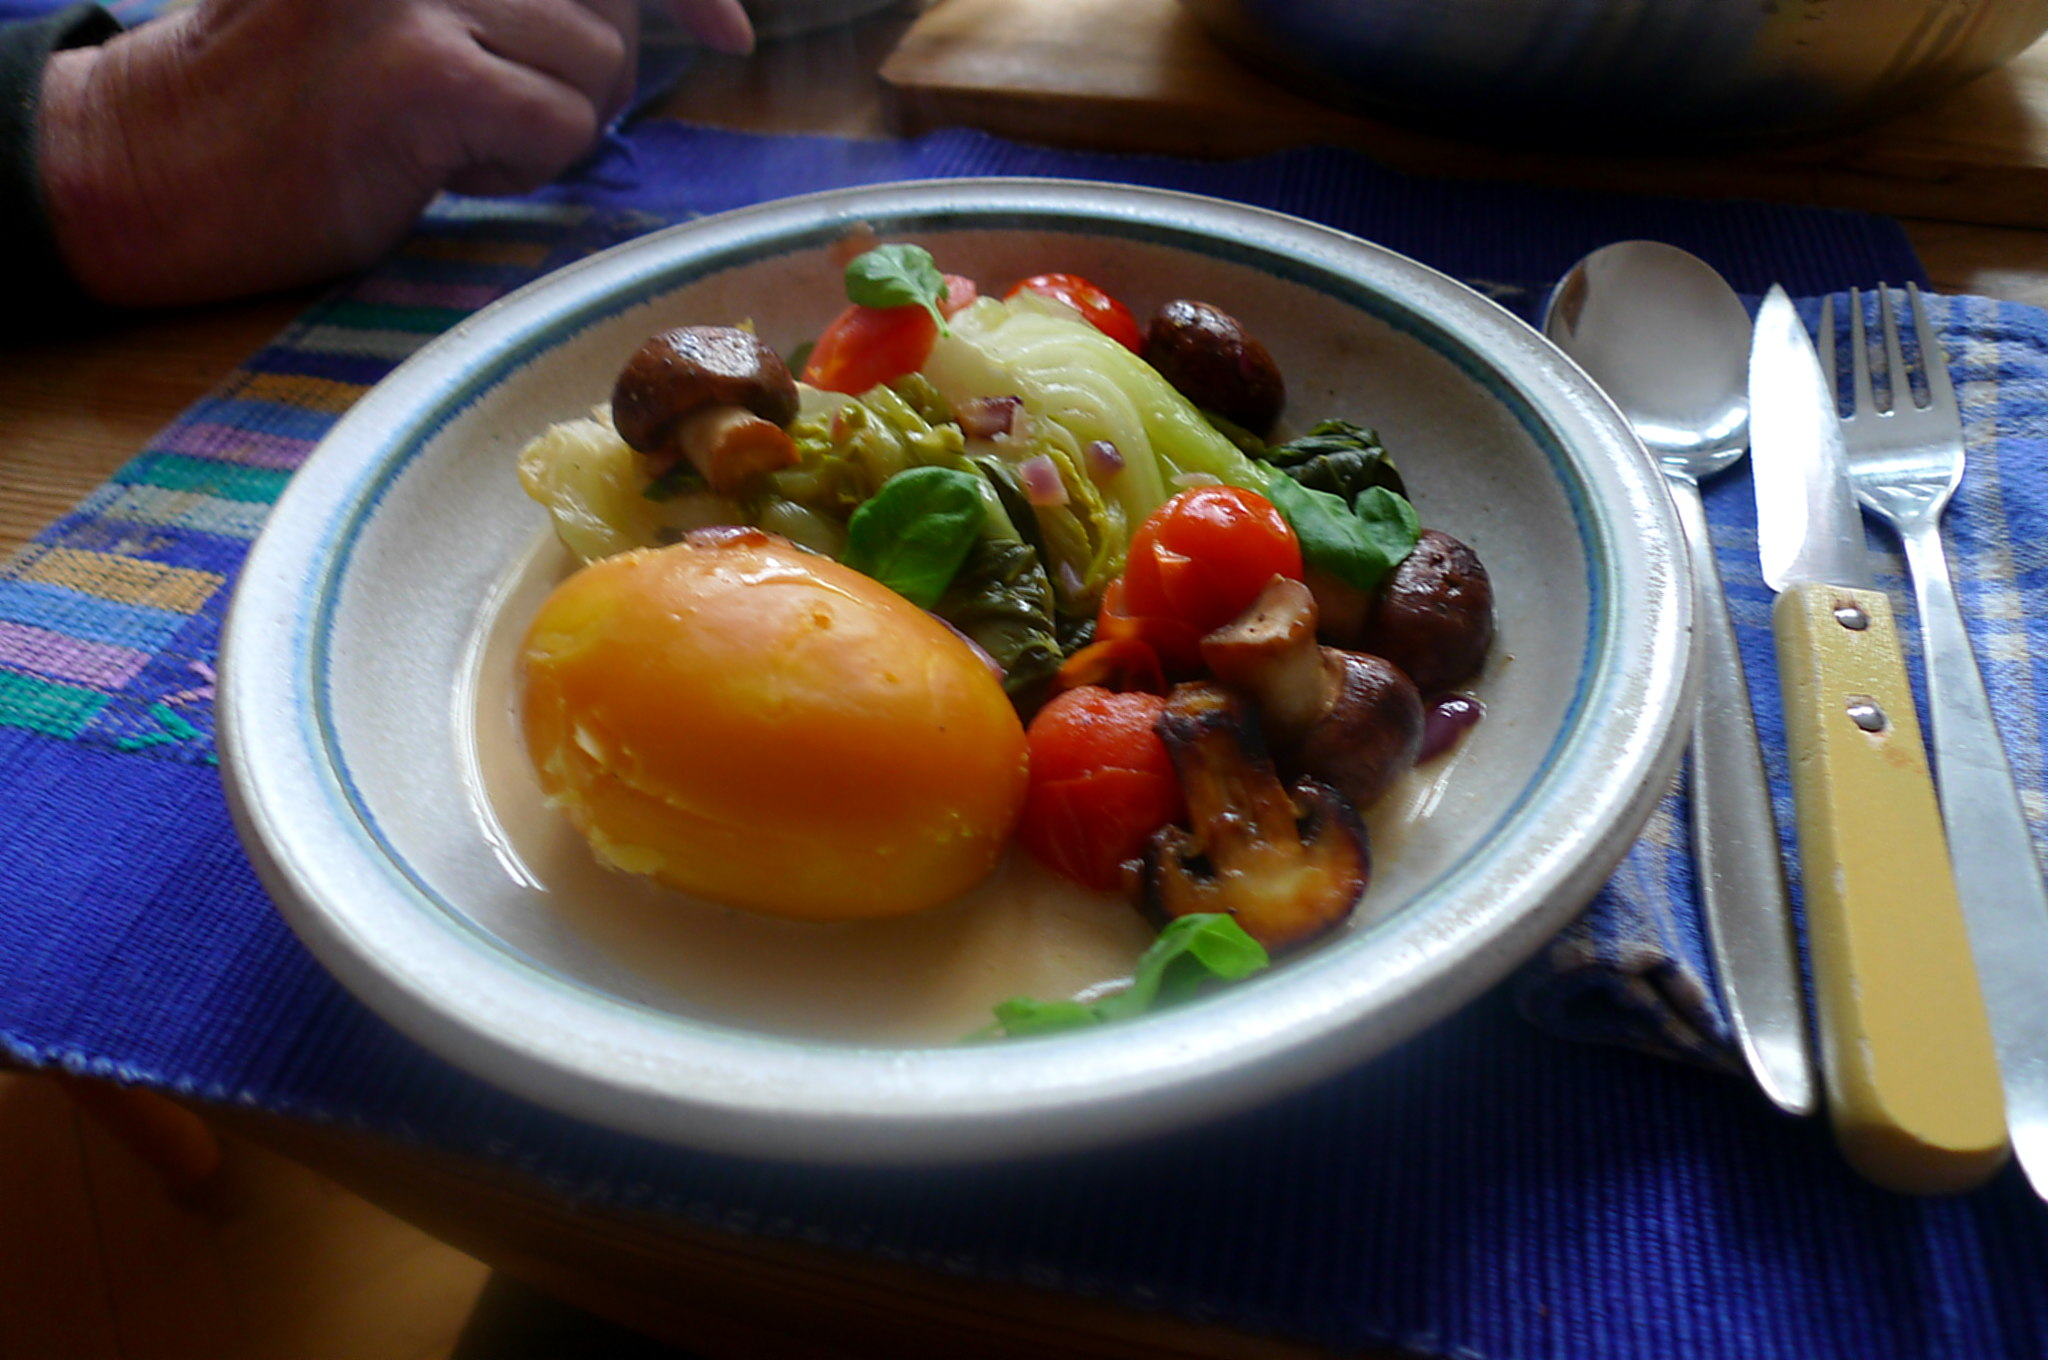 pak-choitomatenchampignonkartoffelnvegetarisch-14